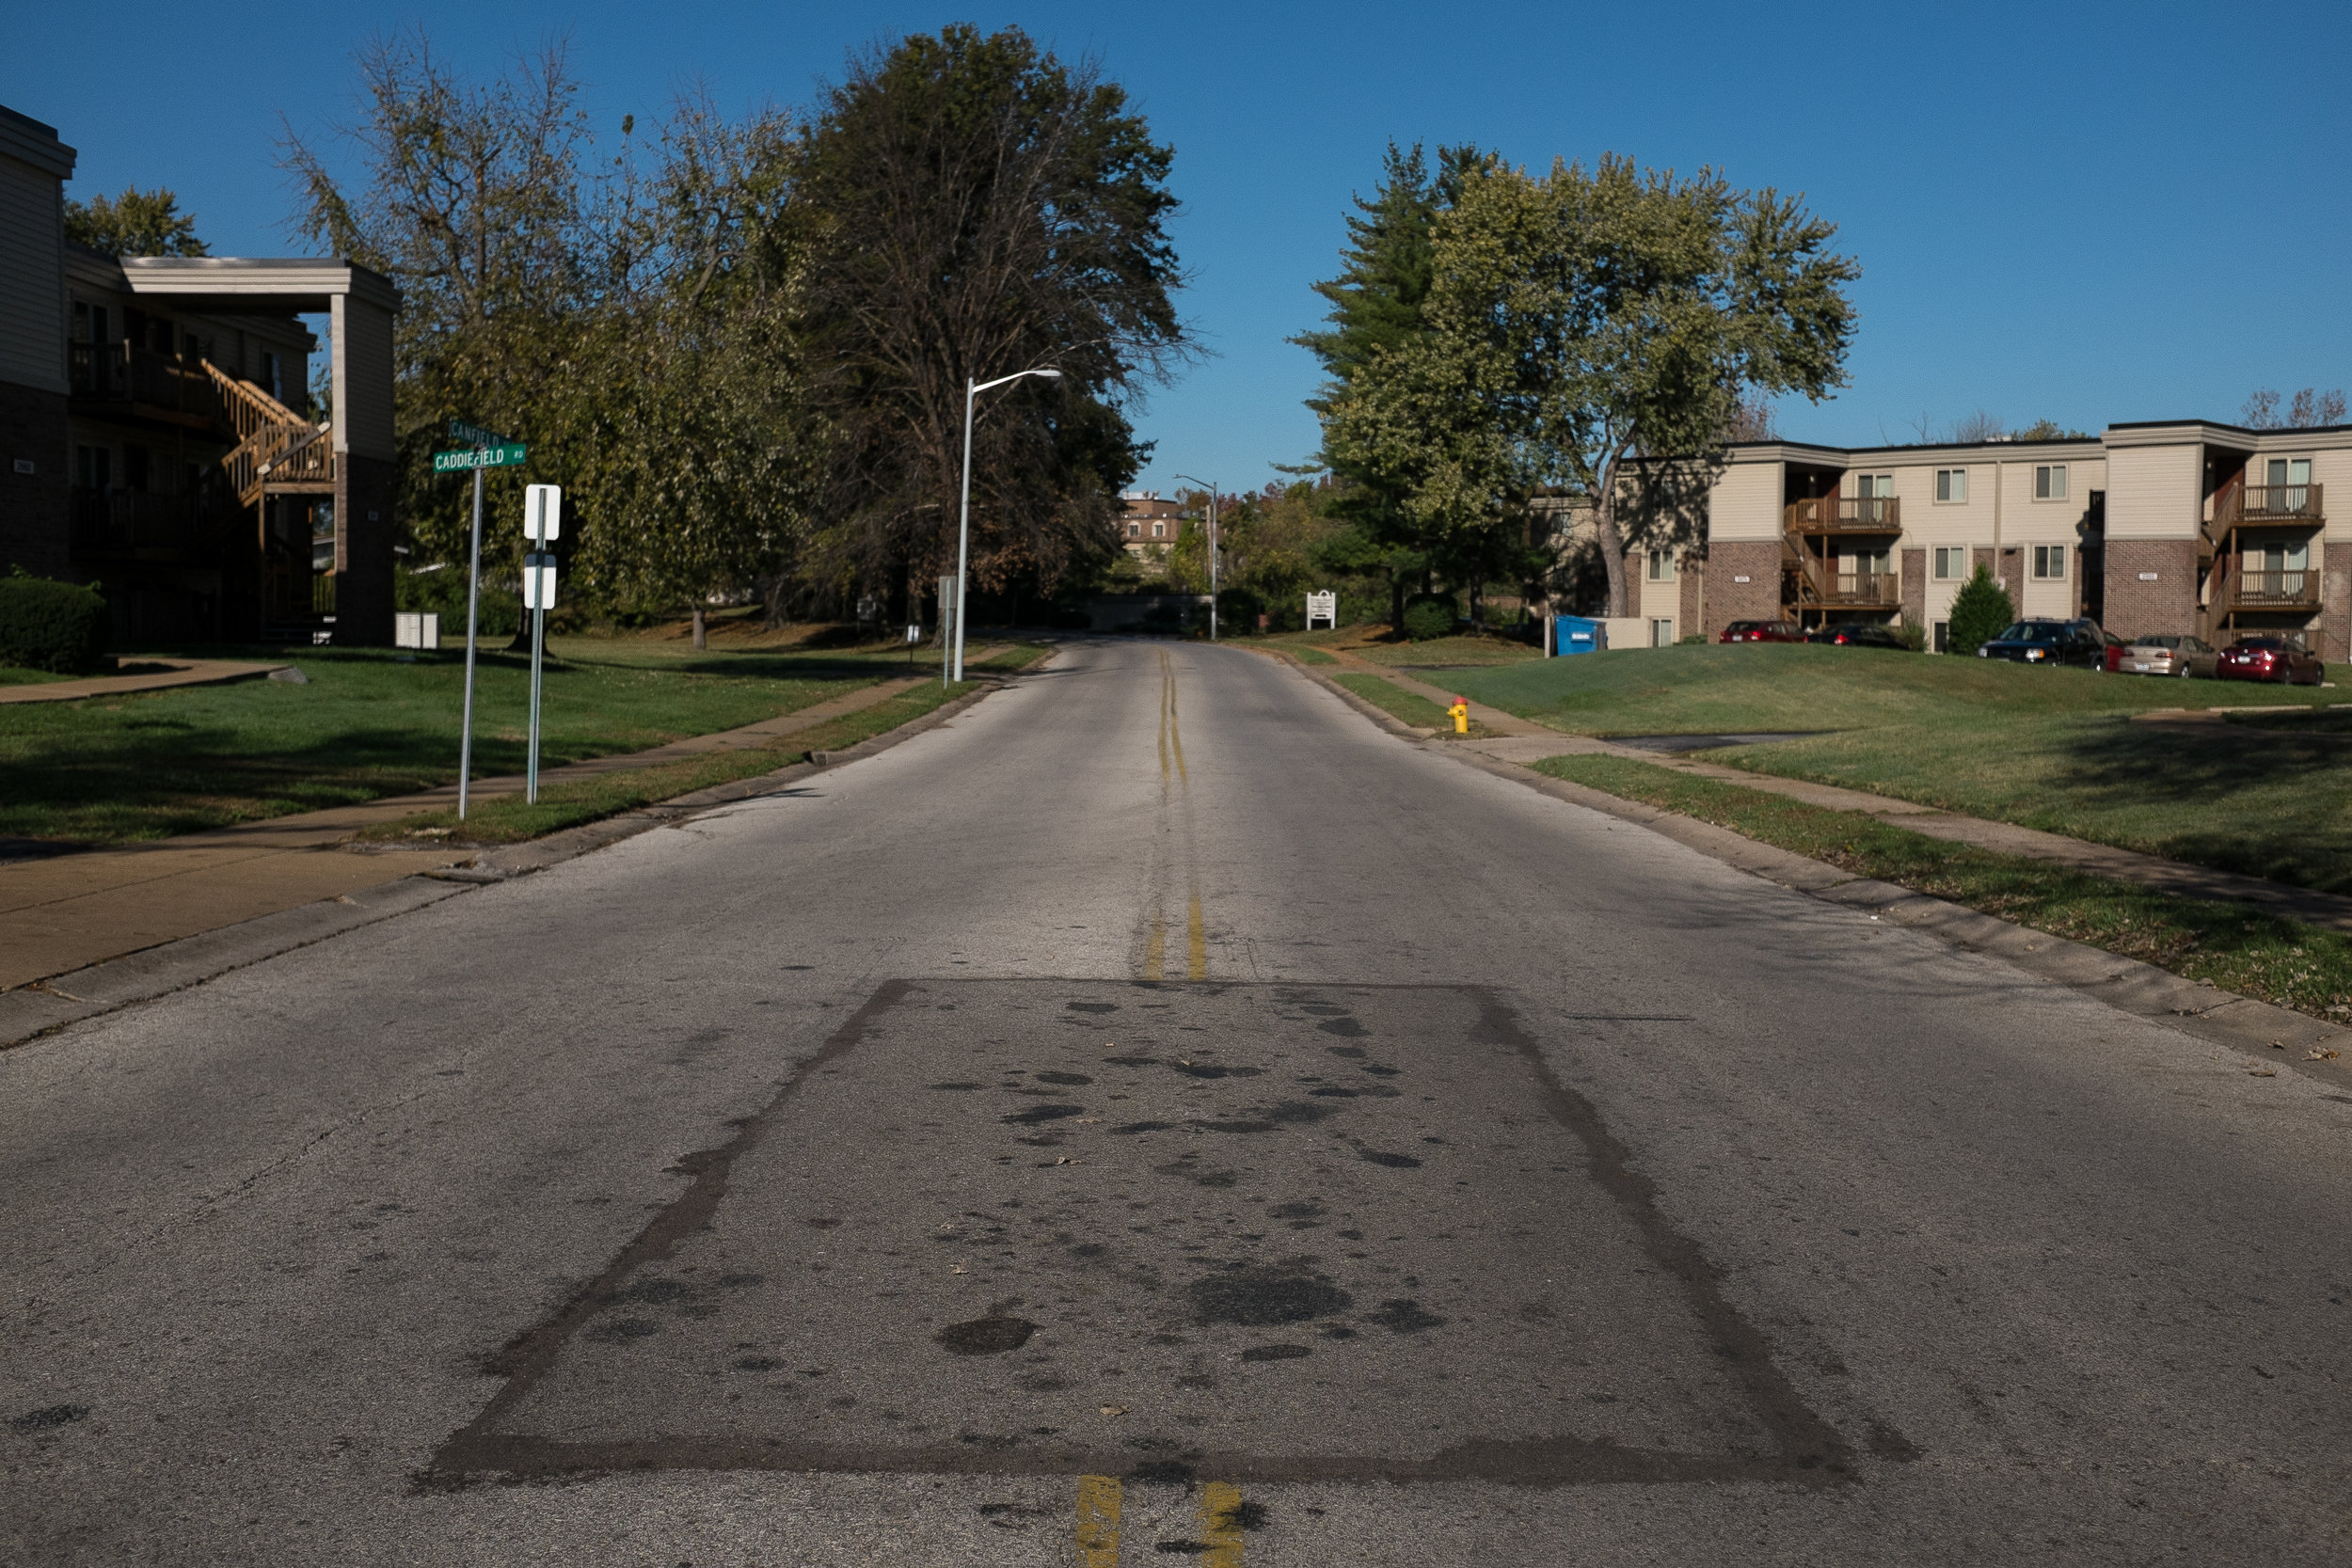 Canfield Drive, Ferguson Missouri, where Michael Brown was shot to death.